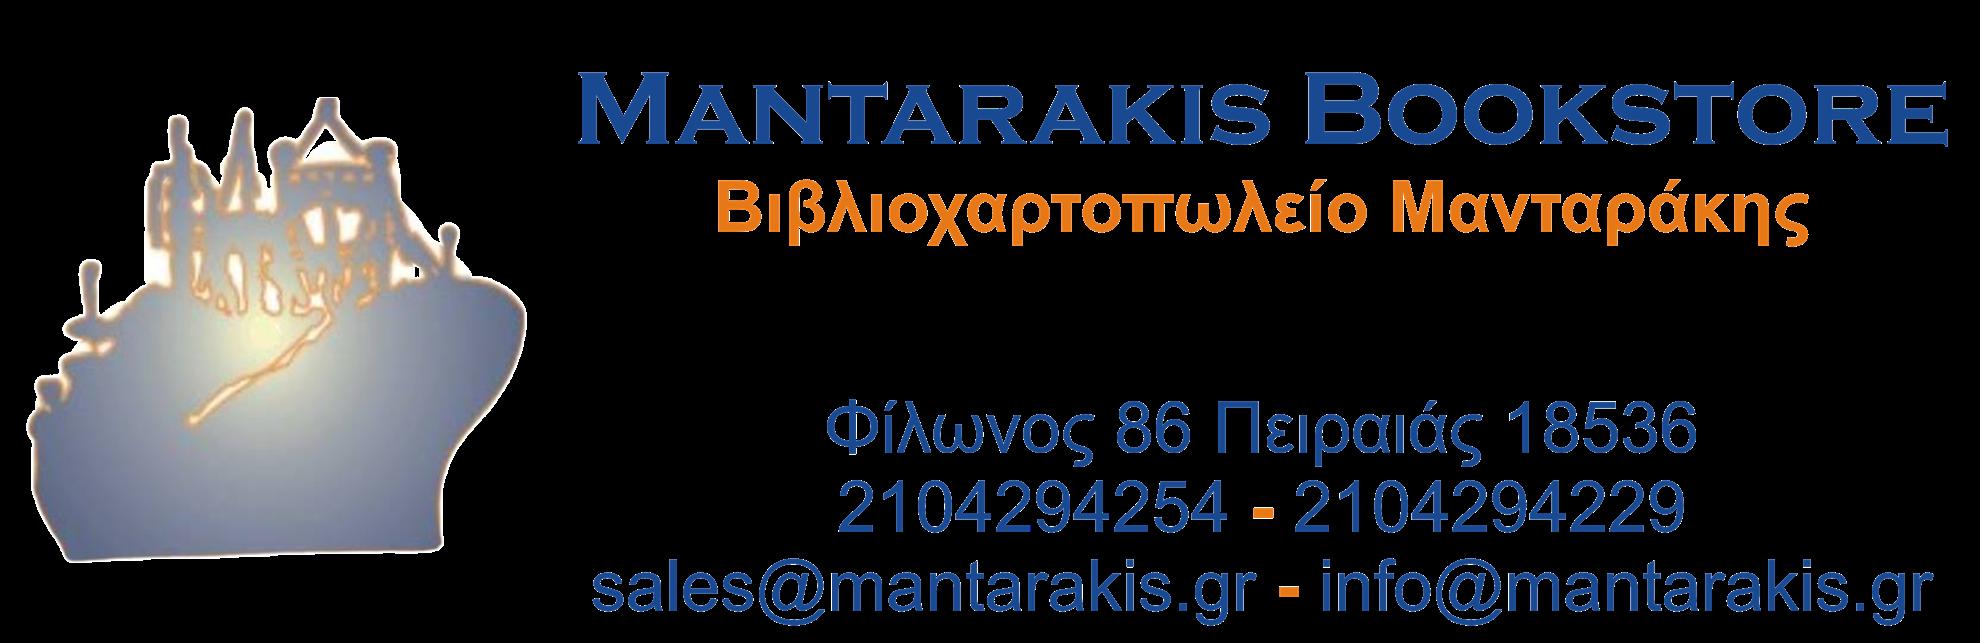 Mantarakis Stationery